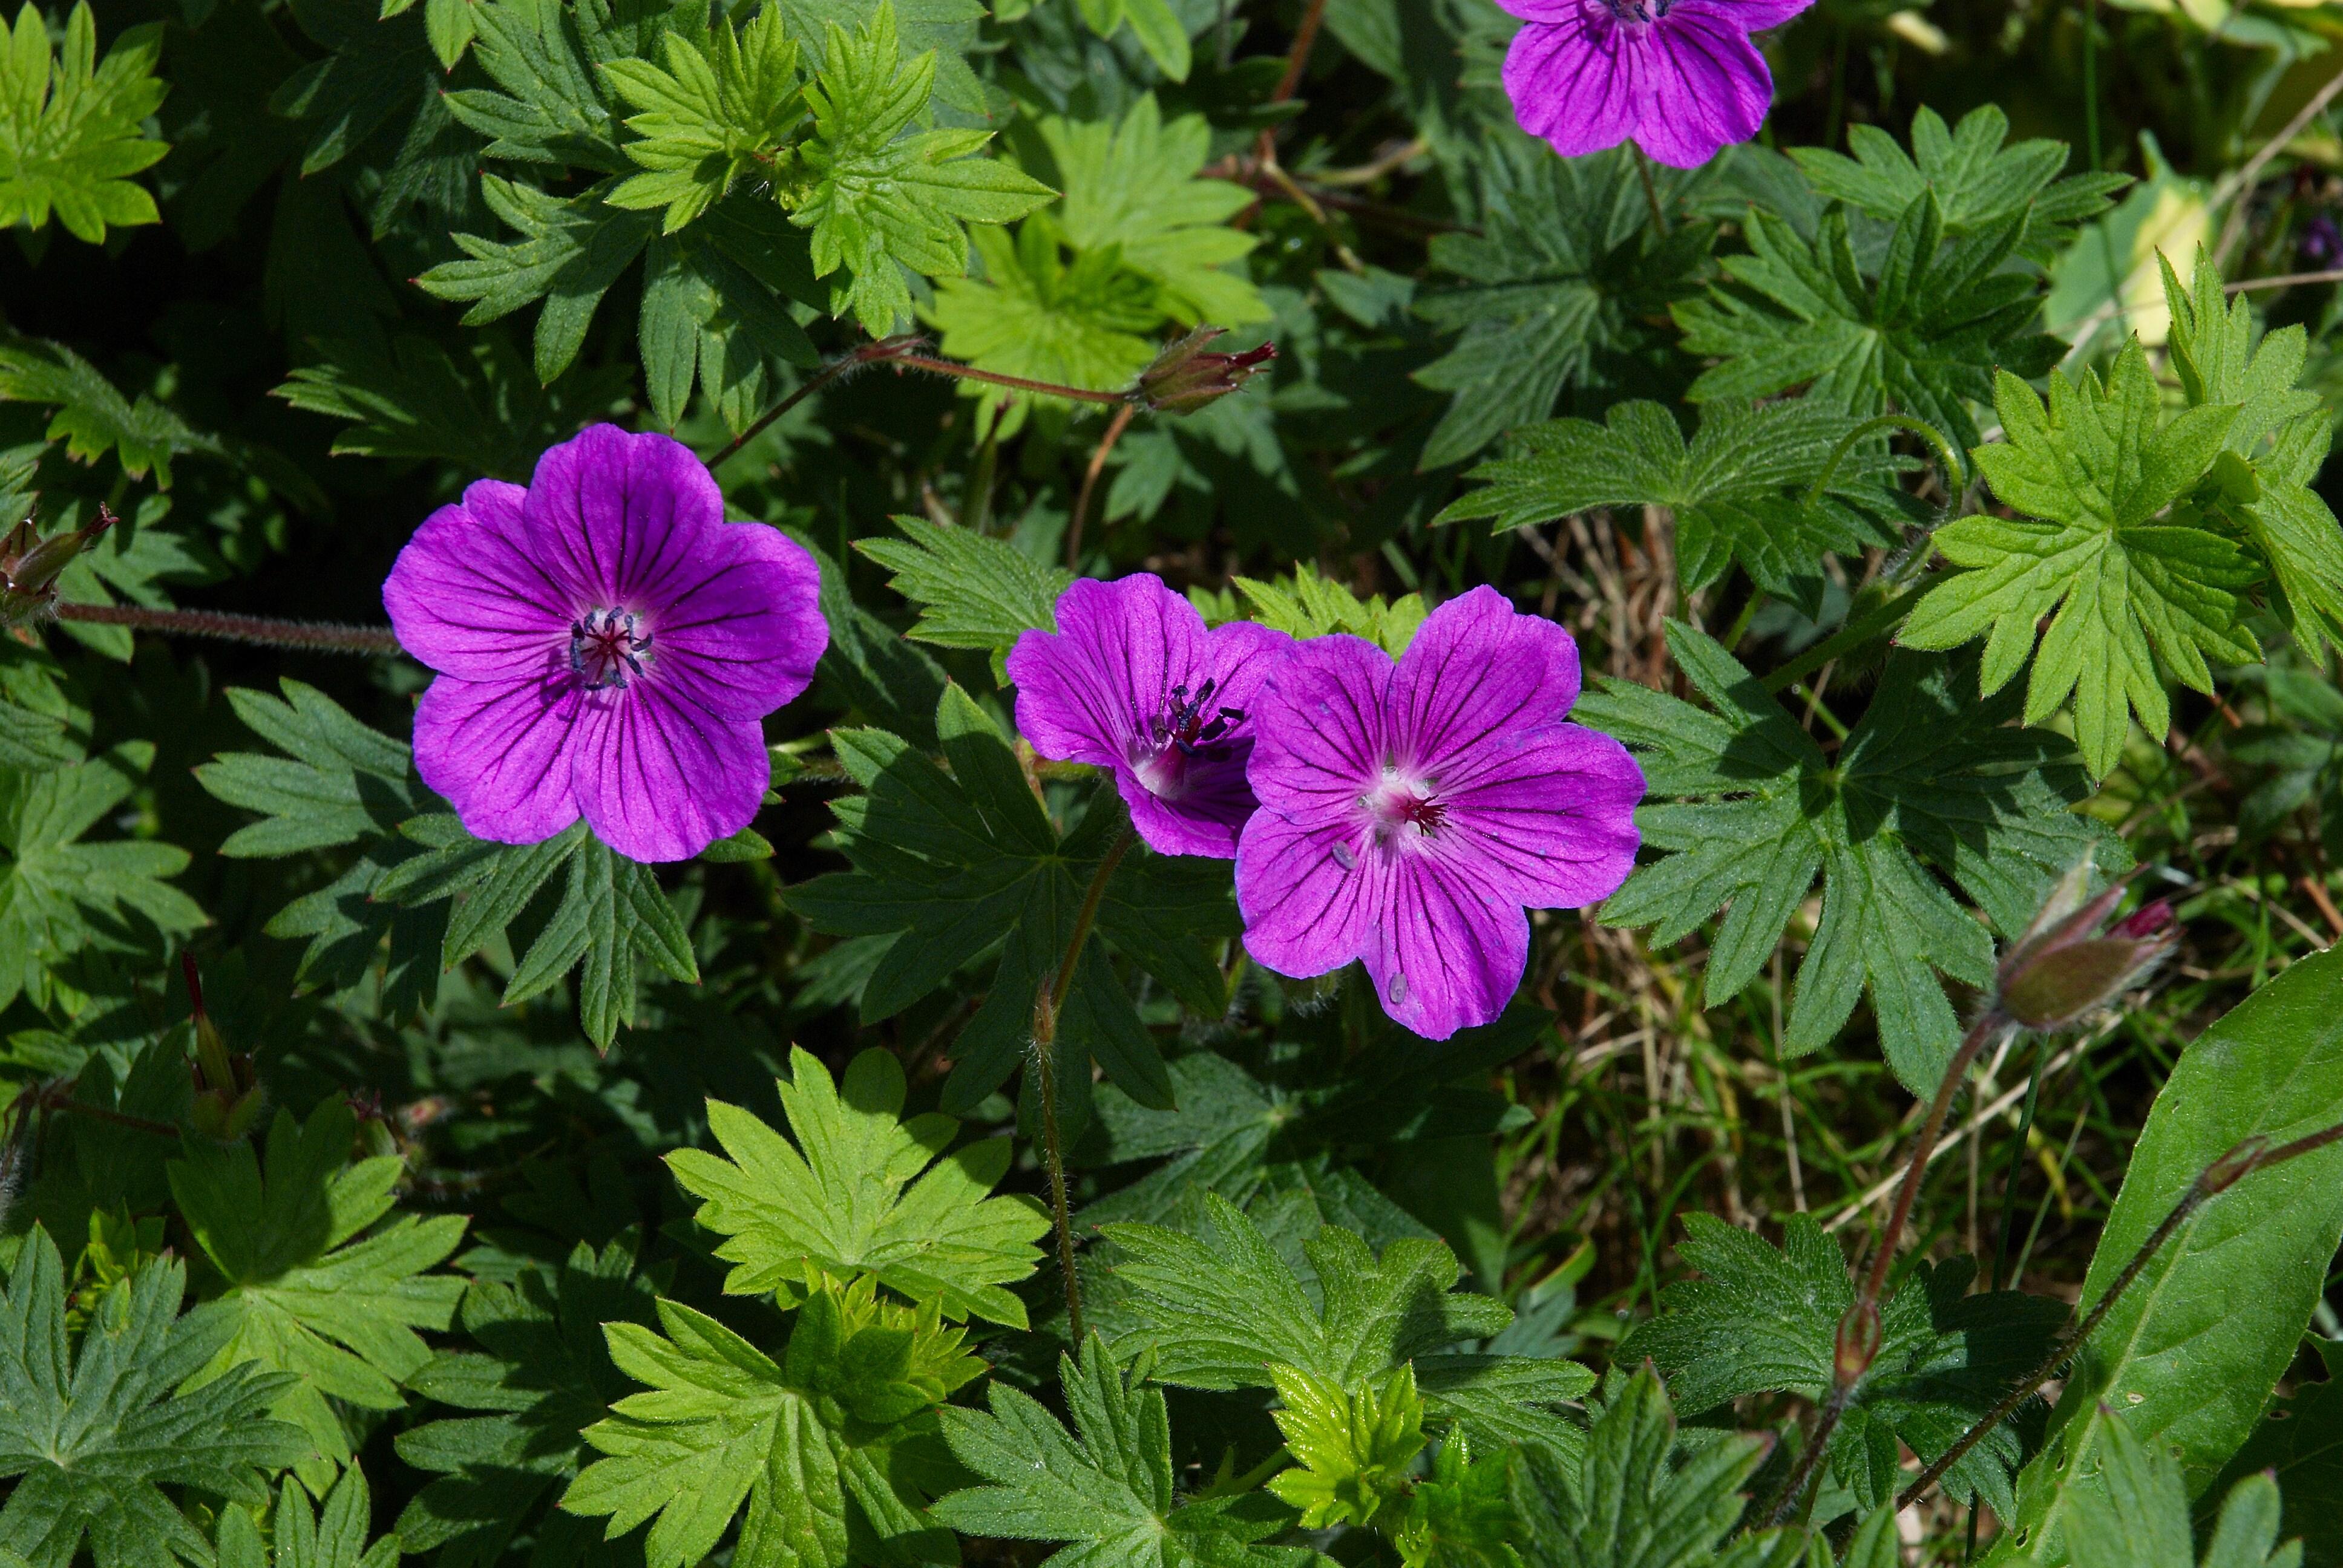 File:Geranium sanguineum Leeds B.jpg - Wikipedia